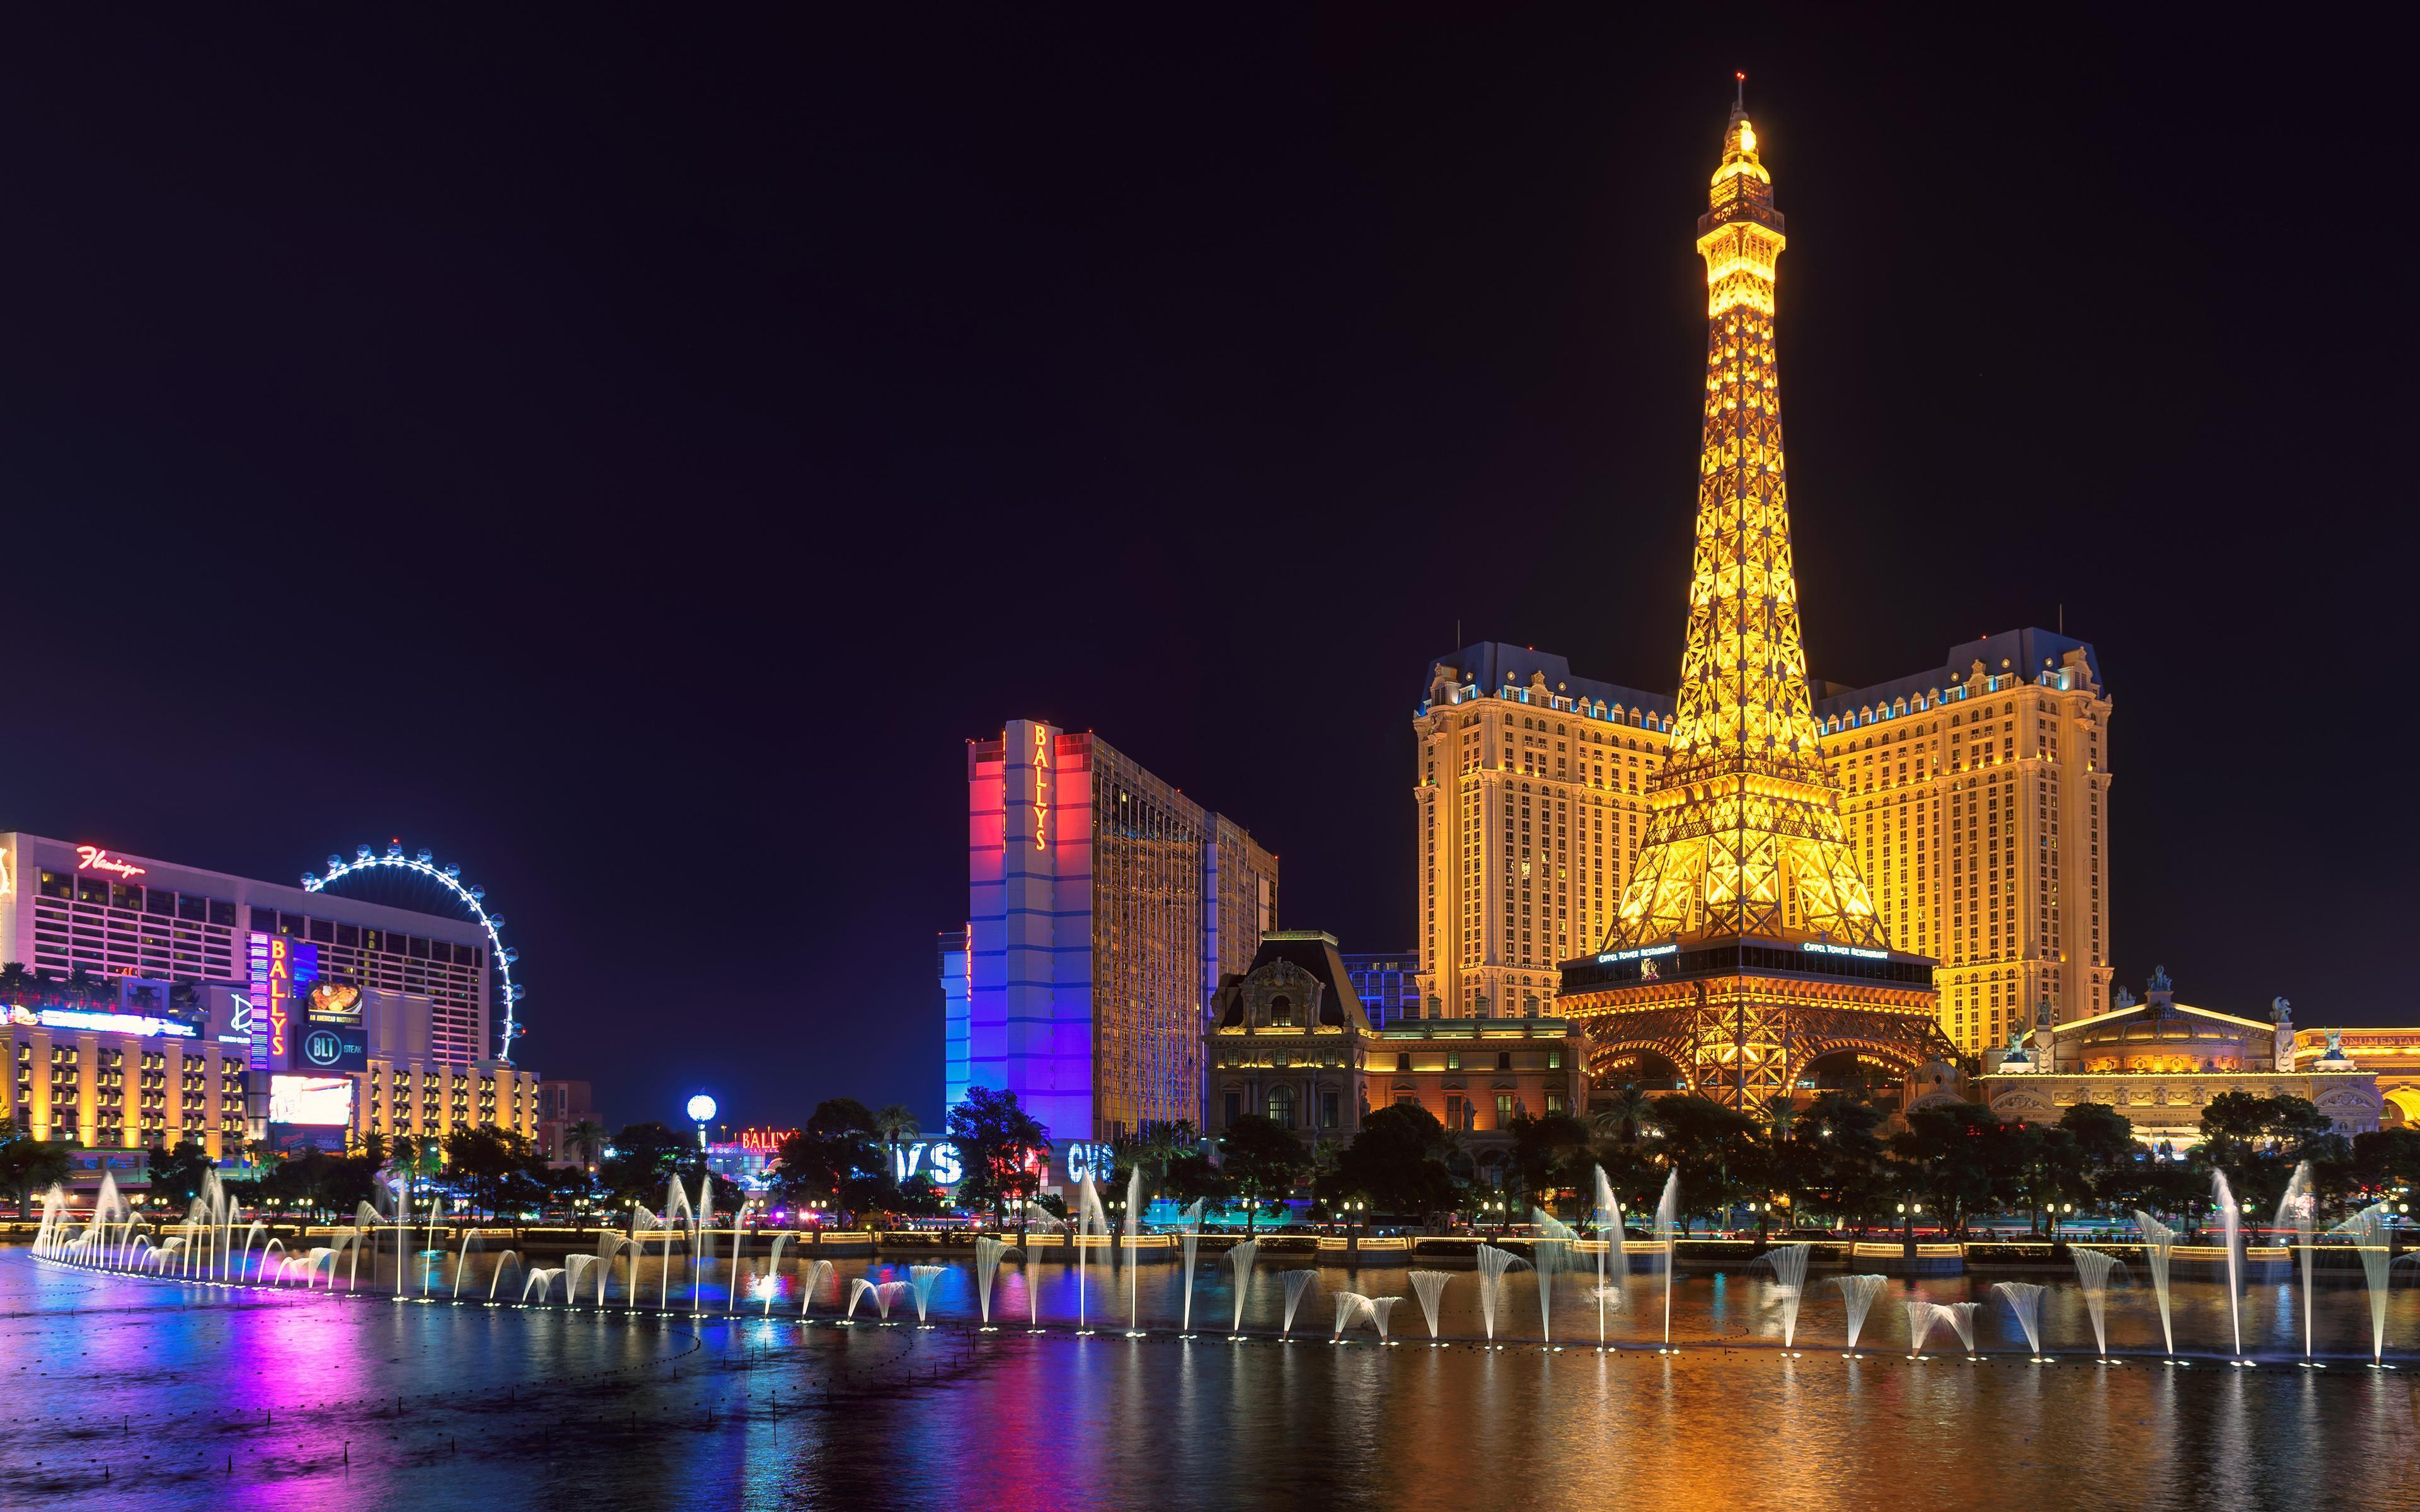 Eiffel Tower Las Vegas Wallpapers Wallpaper Cave